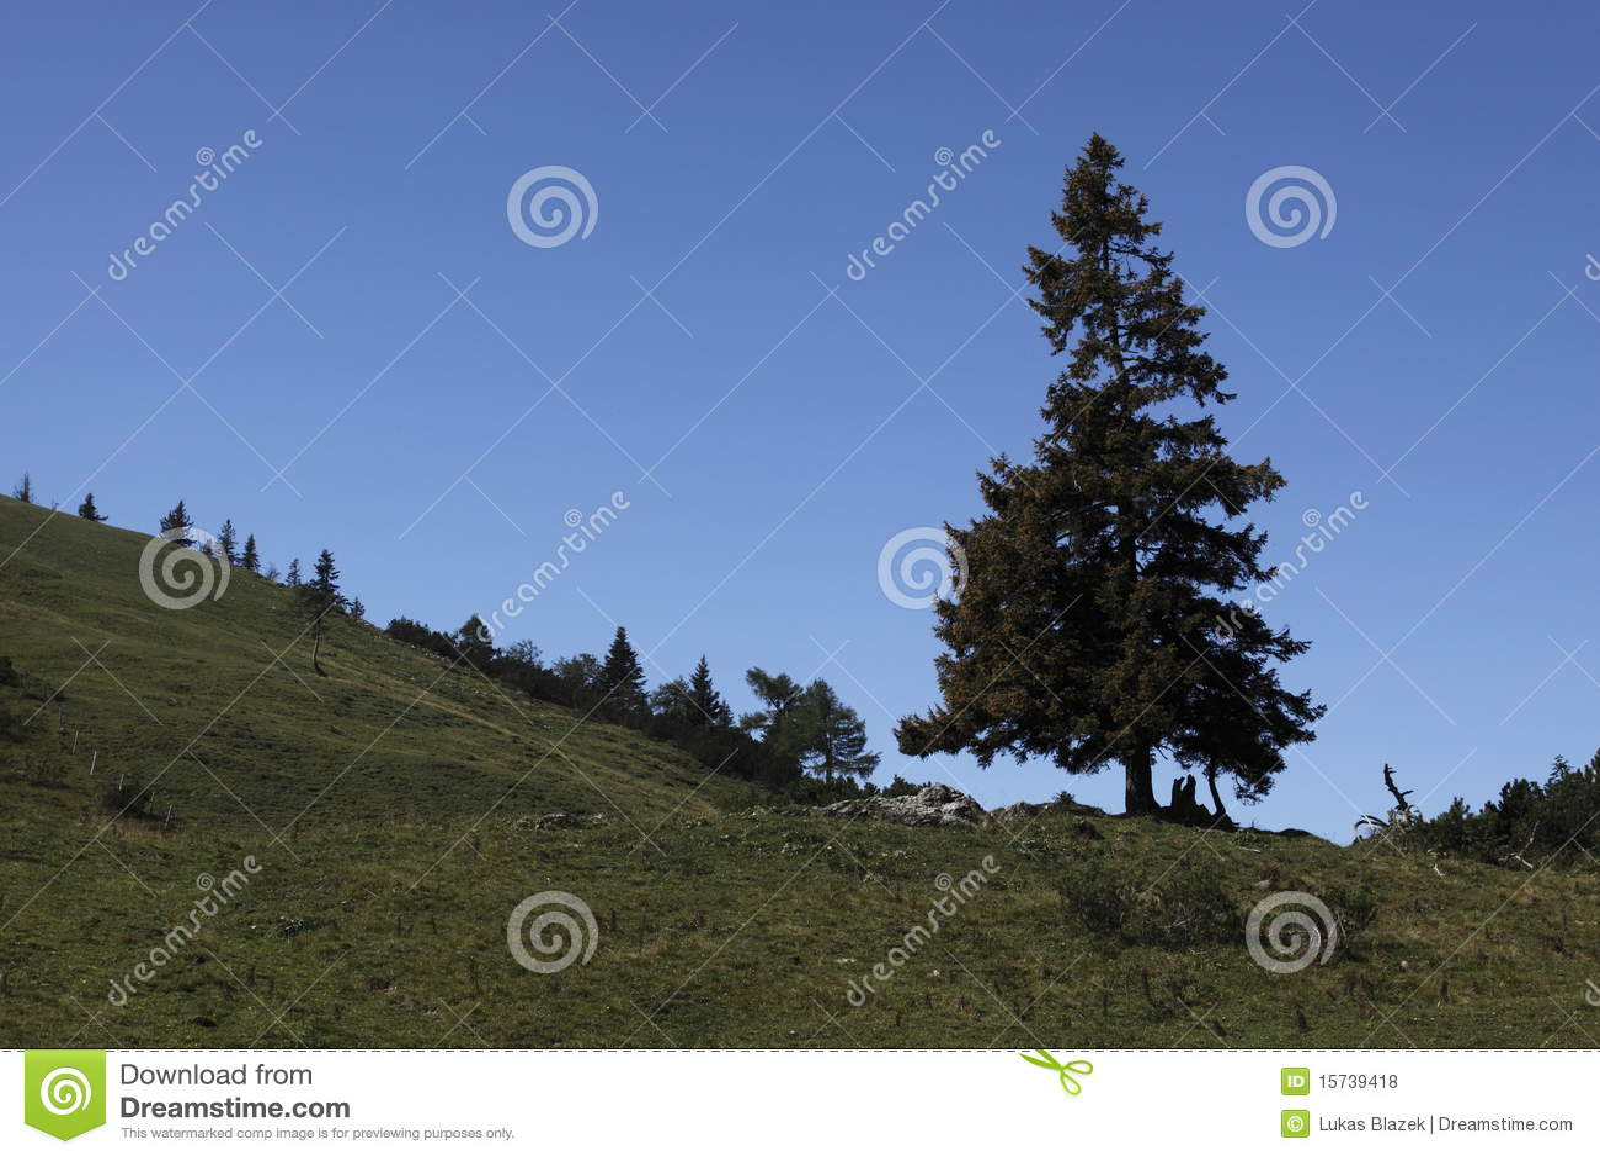 tree peaks solitaire